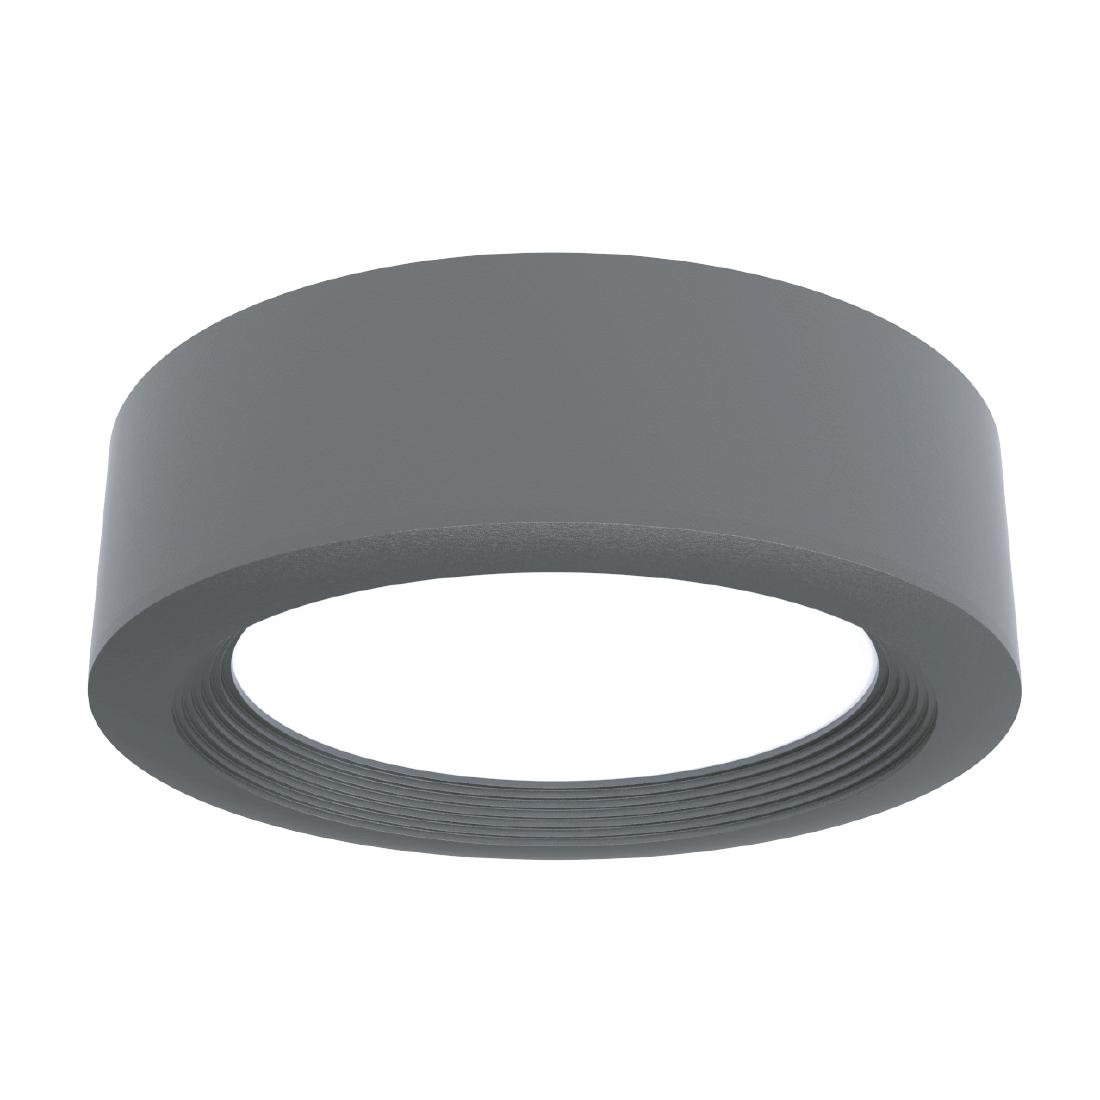 LW-SUMYP21-01 - Sıva Üstü İkili LED Spot